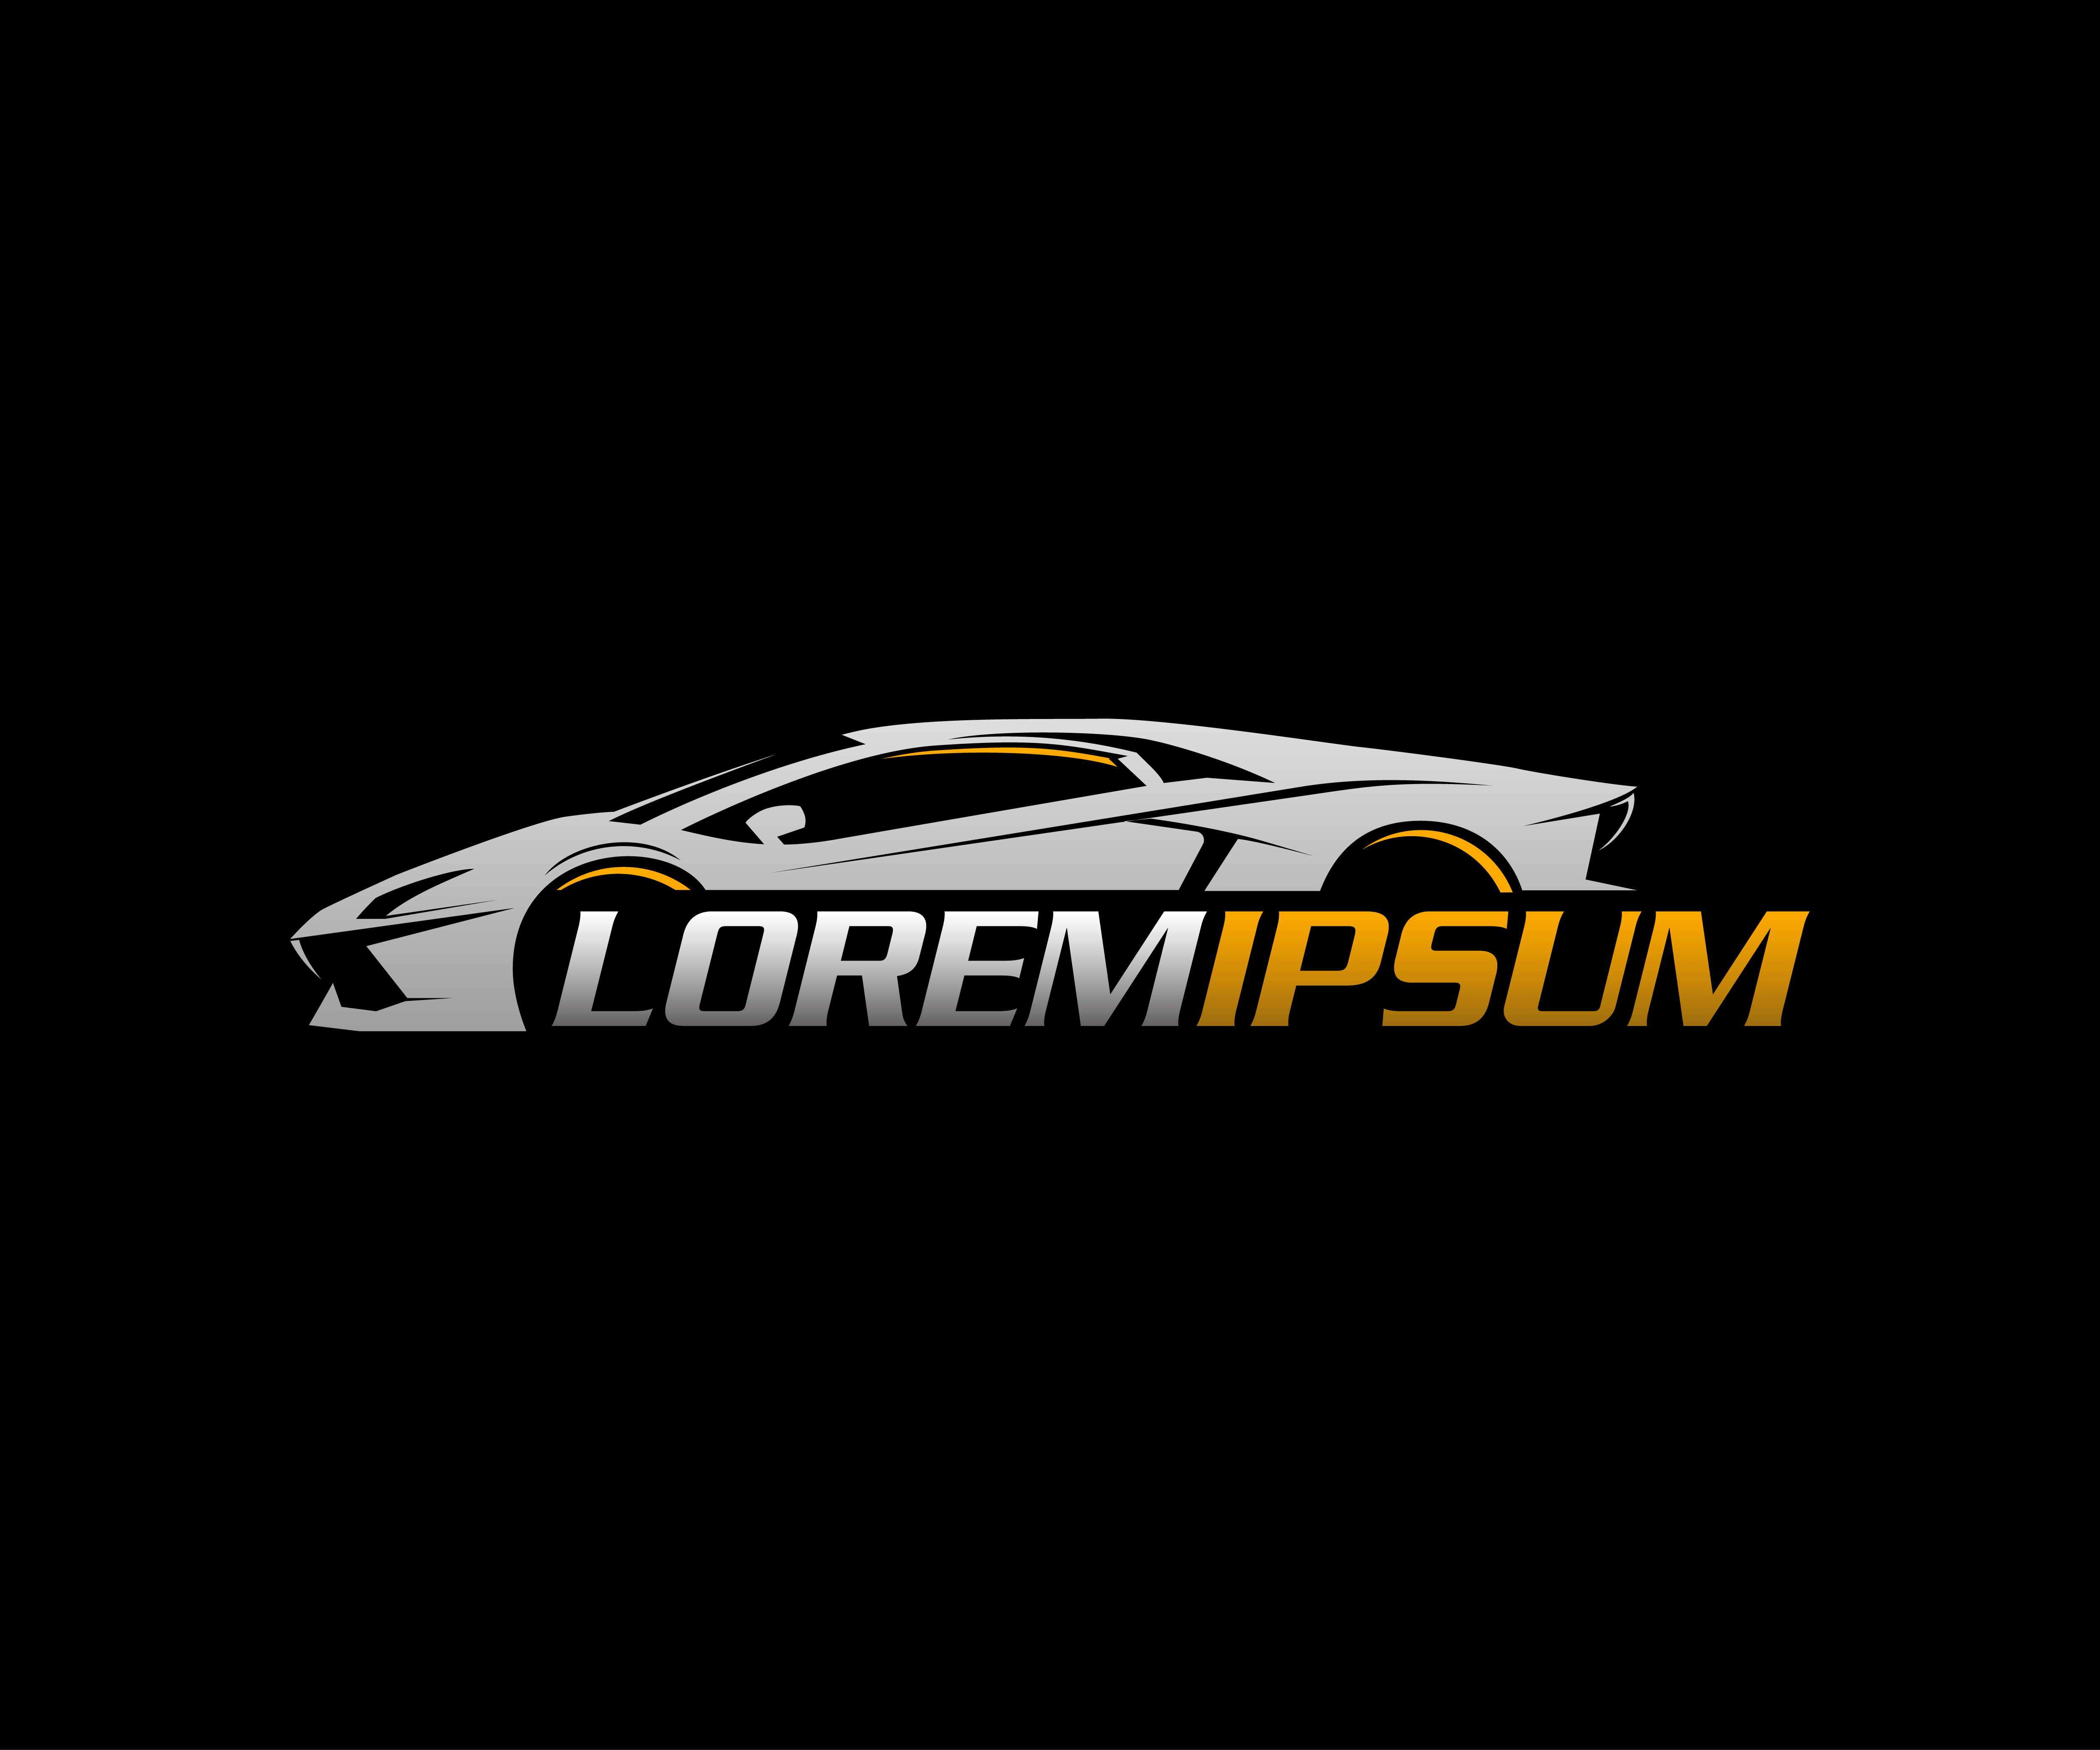 Auto Logo . Sport Car Logo Design Concept Template